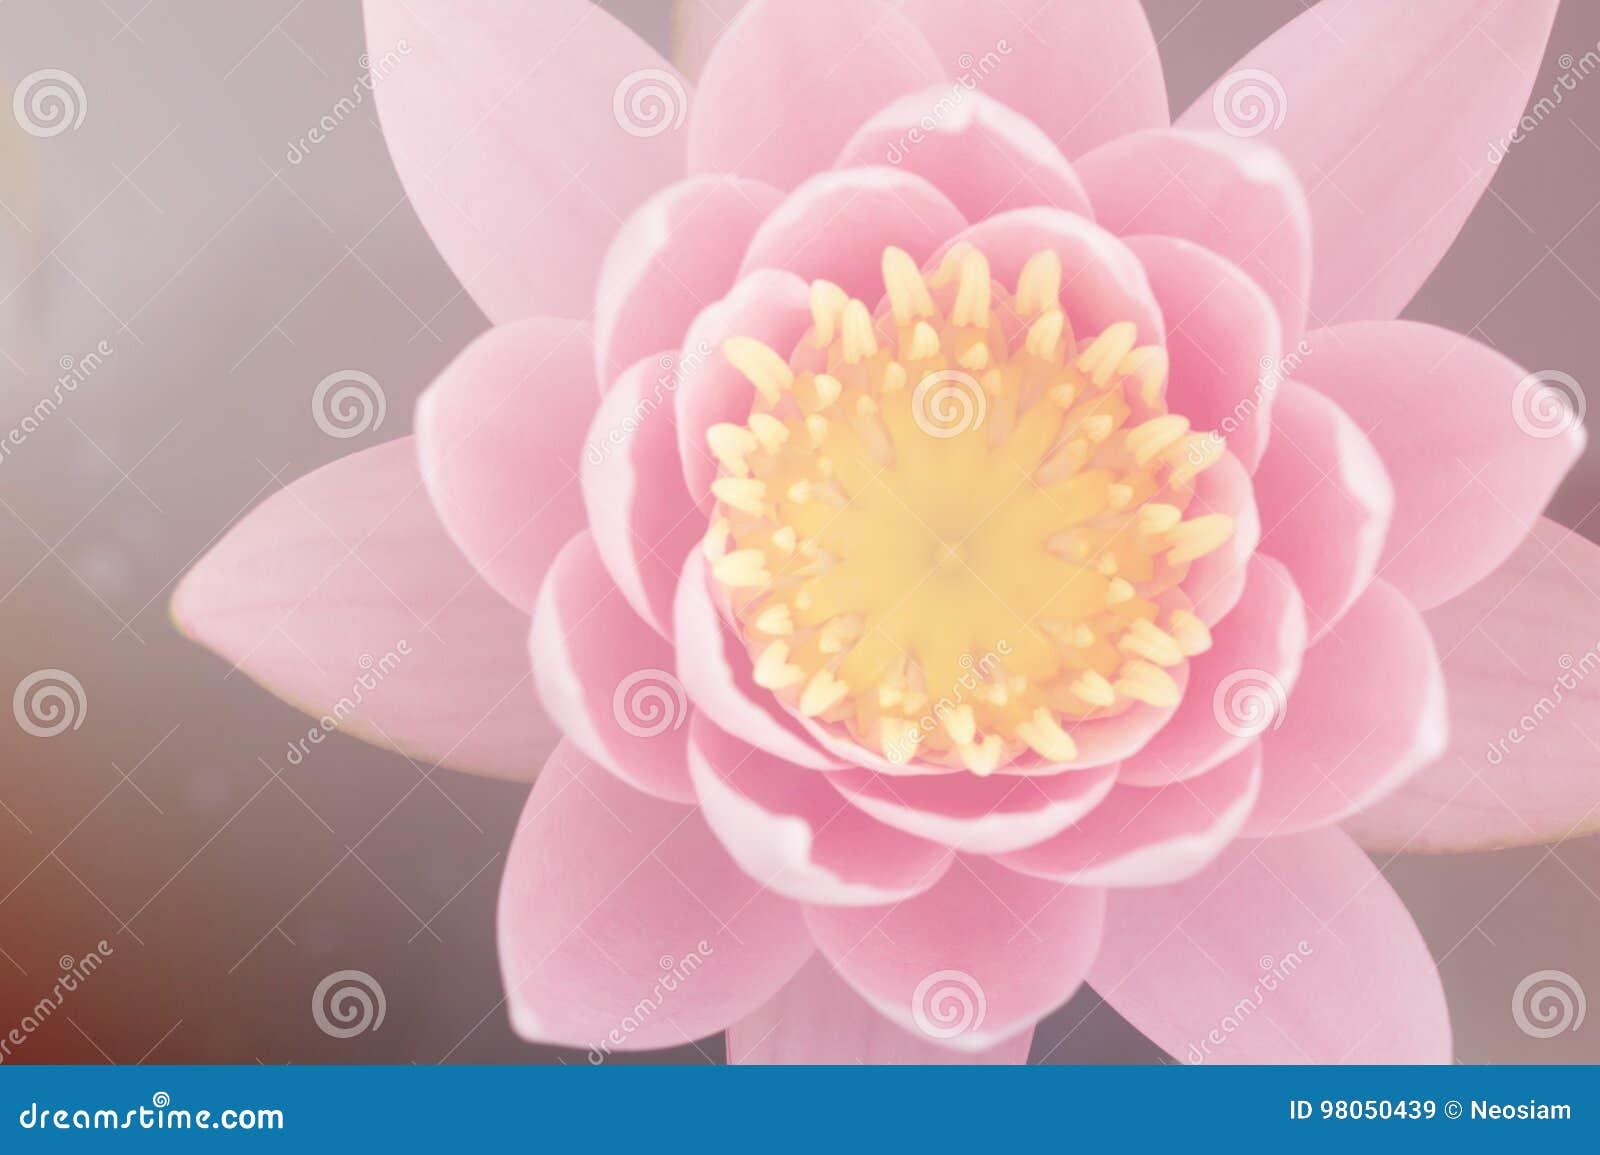 Lotus flowers stock image image of flower fresh abstract 98050439 lotus flowers in pastel colors sweet background izmirmasajfo